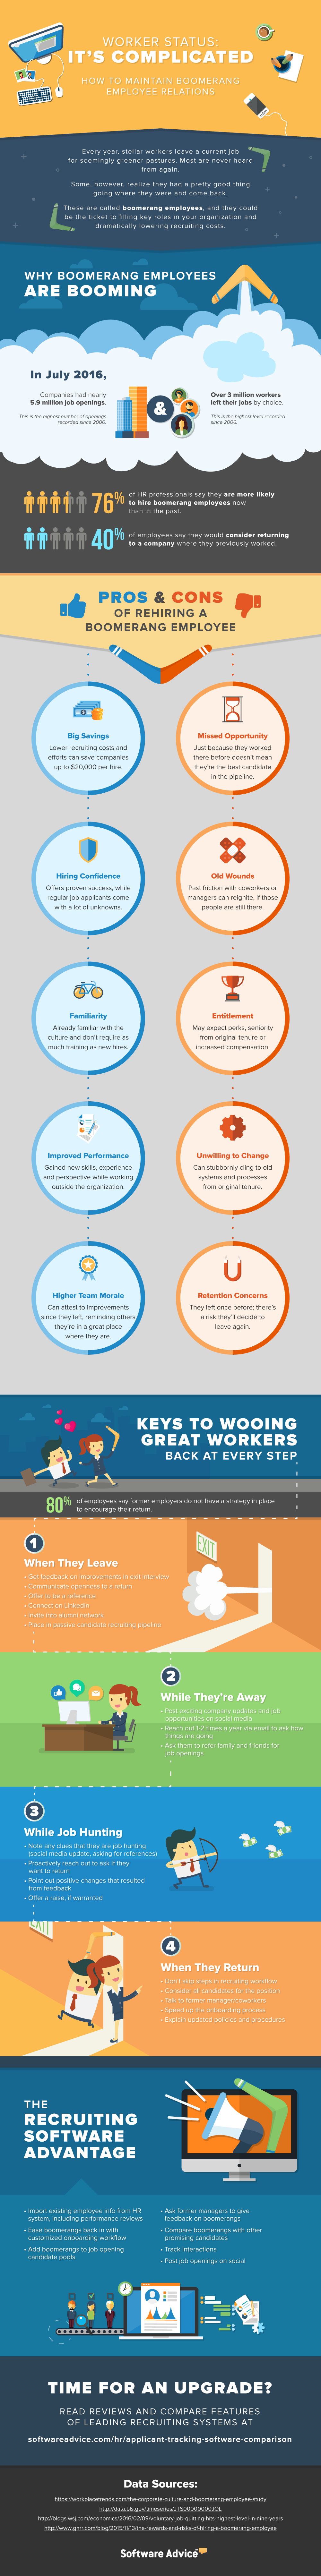 boomerang employees infographic